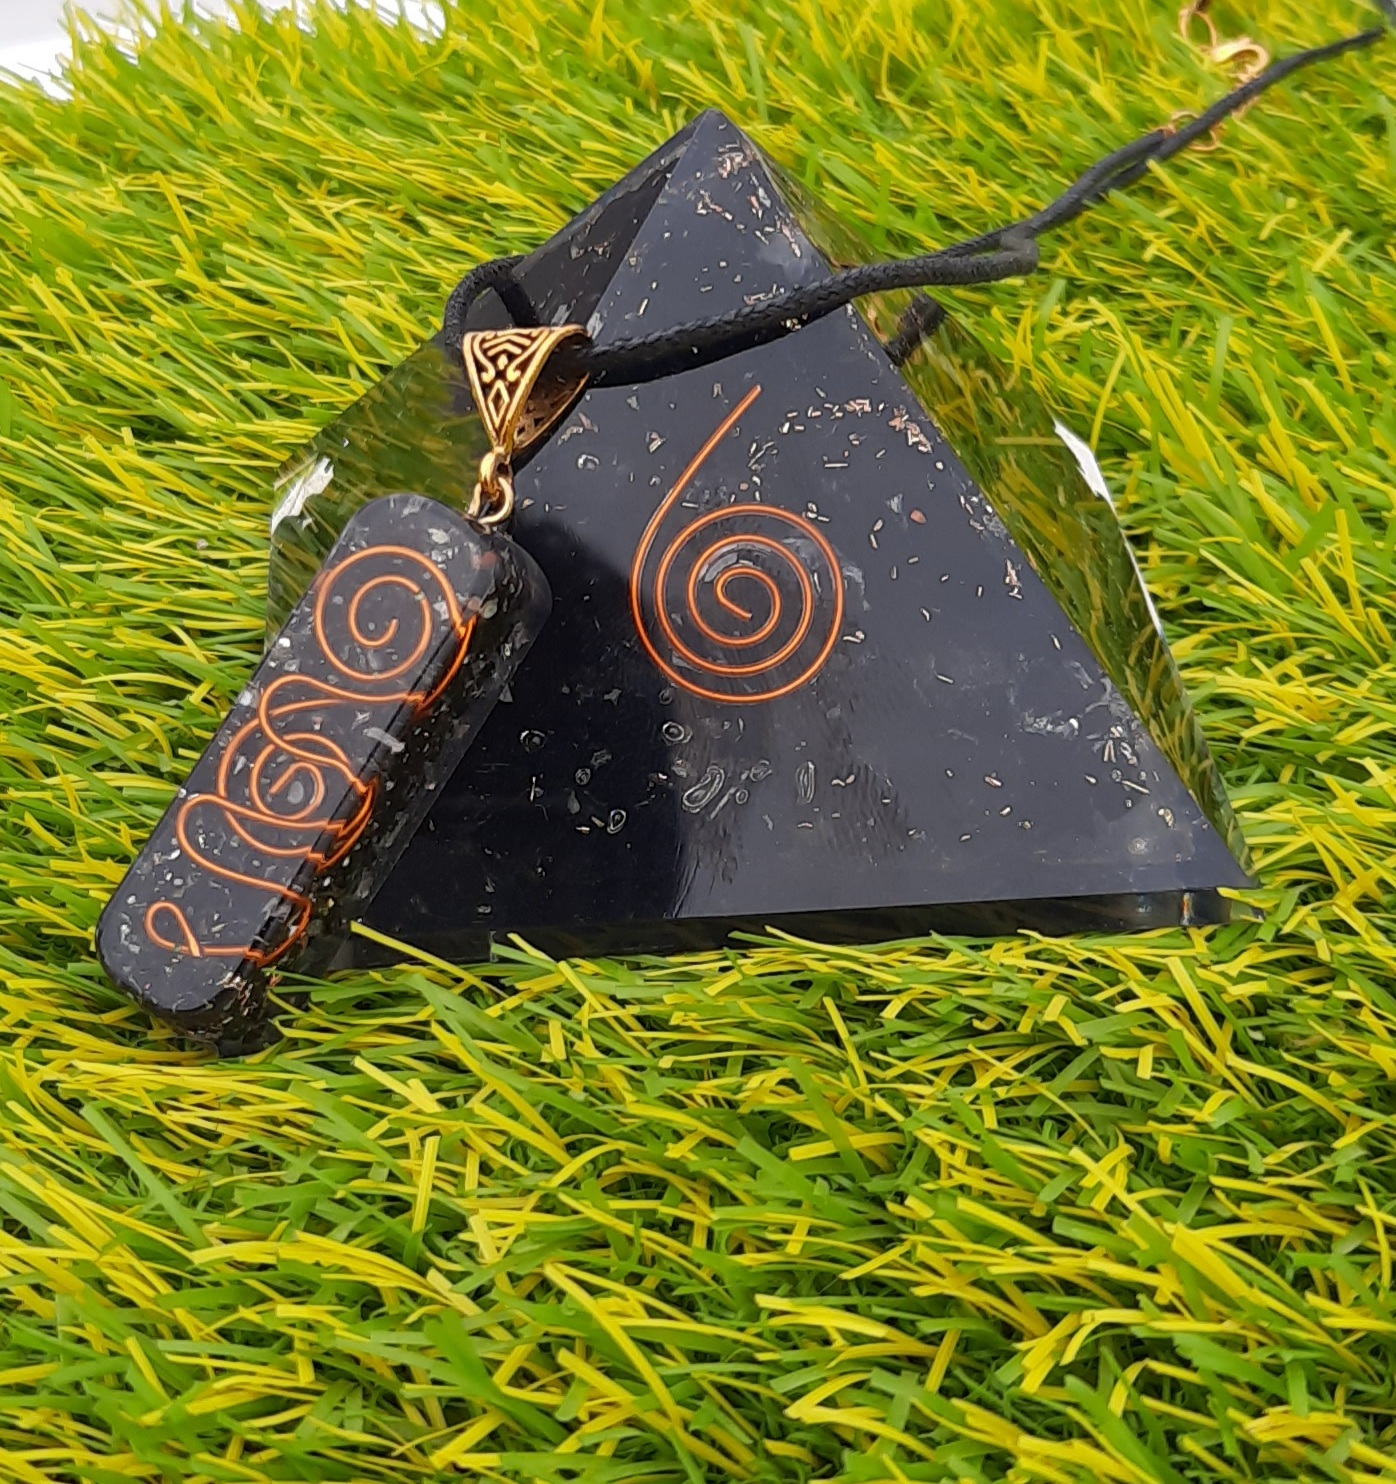 Orogne Black Tourmaline Healing EMF Stone Pyramid With Pendant